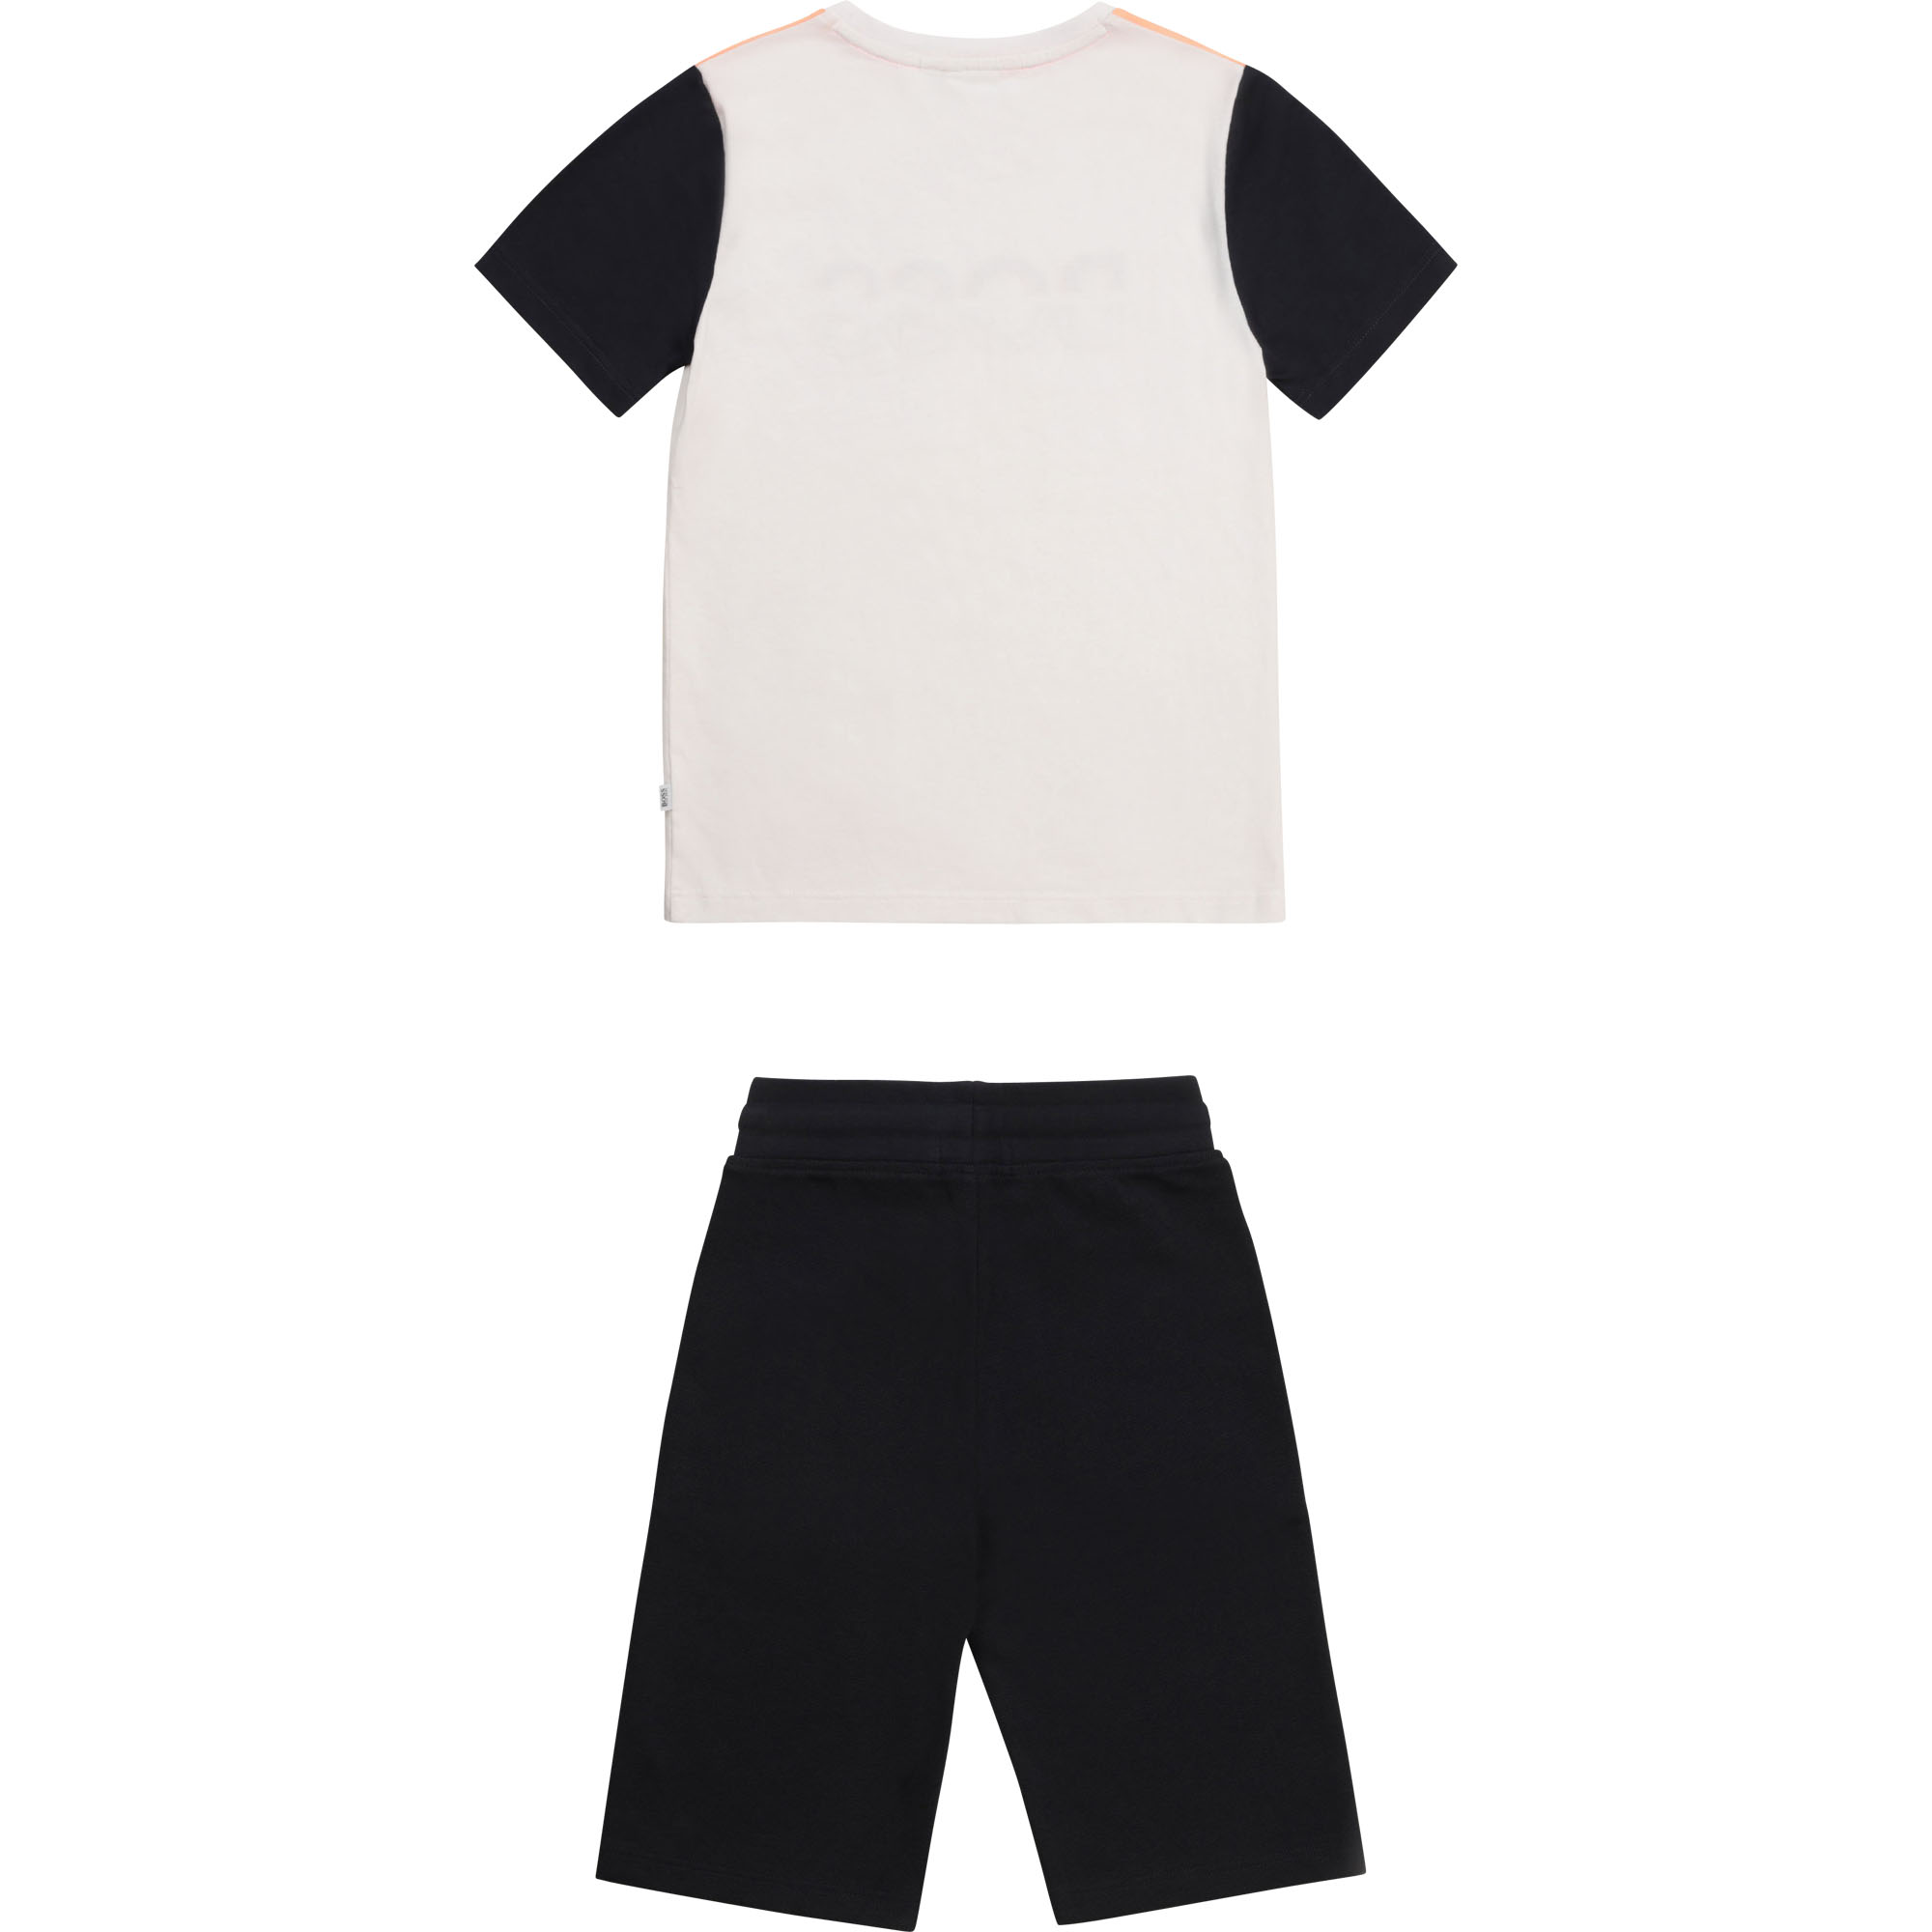 T-shirt + Bermuda shorts set BOSS for BOY